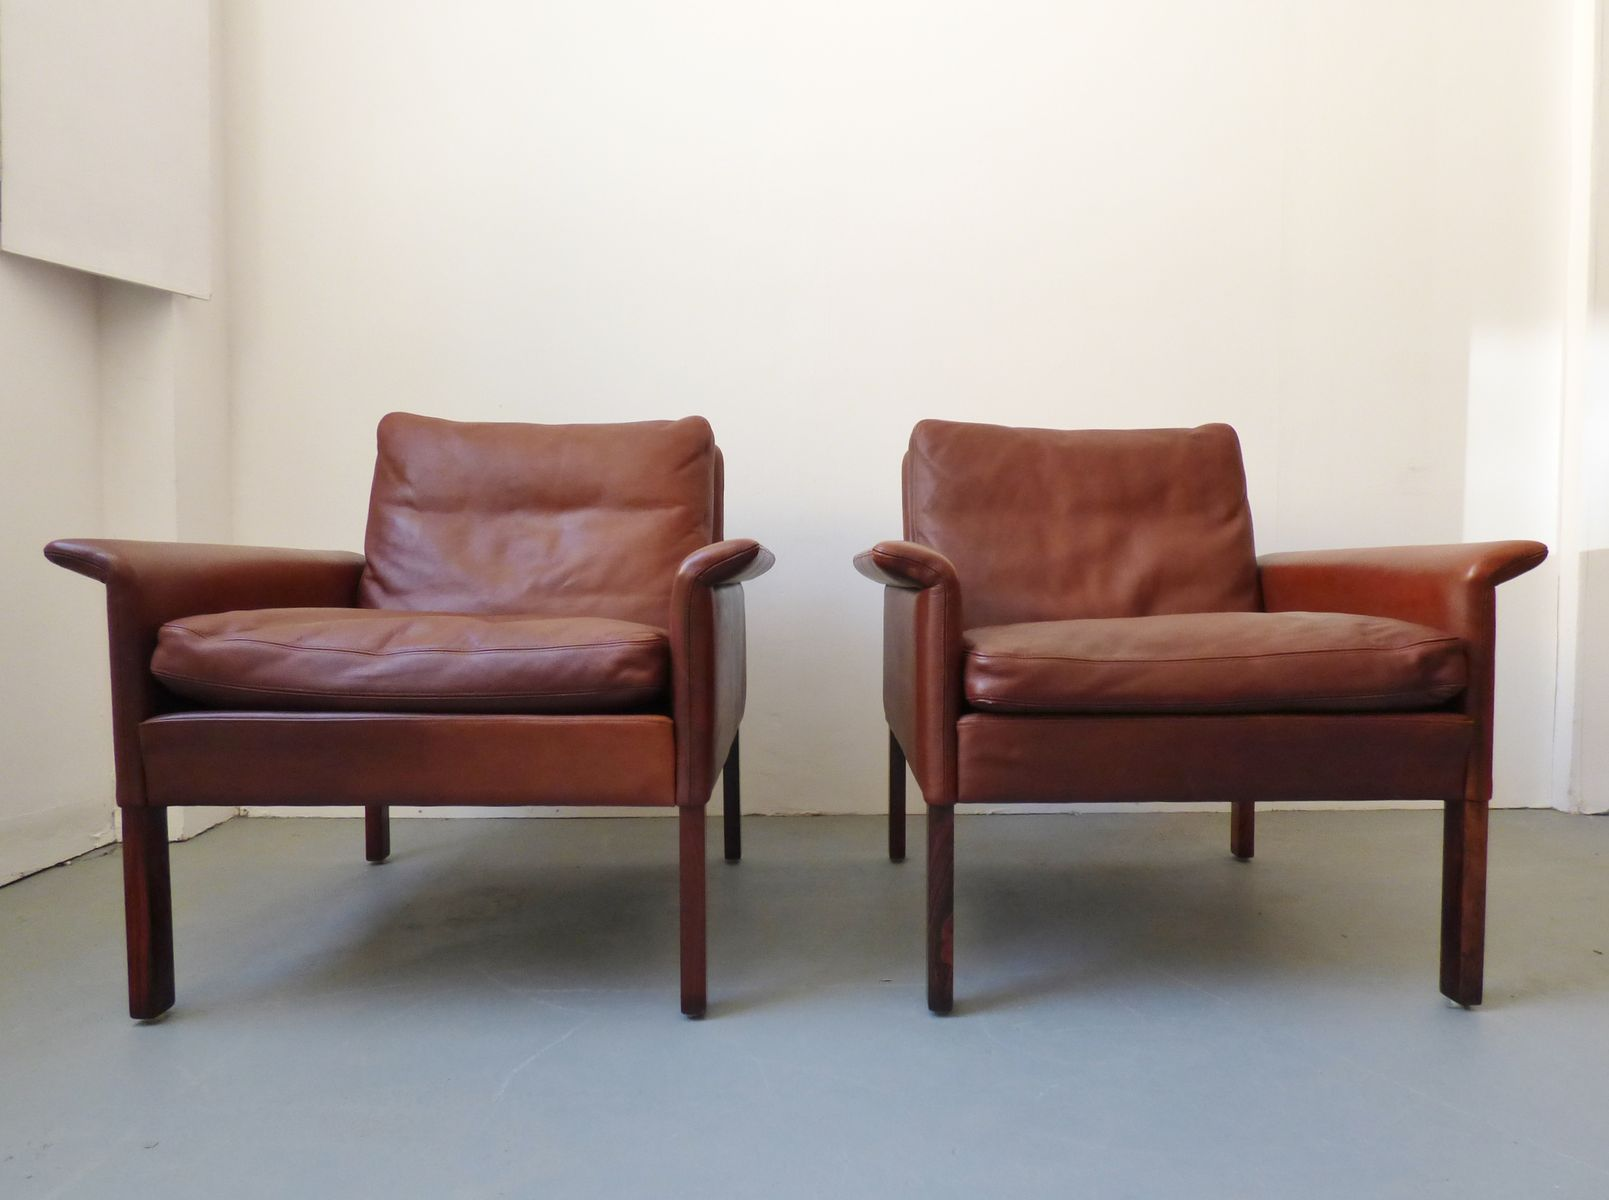 brauner modell 500 leder palisander armlehnstuhl von hans olsen f r skipper 1960er bei pamono. Black Bedroom Furniture Sets. Home Design Ideas